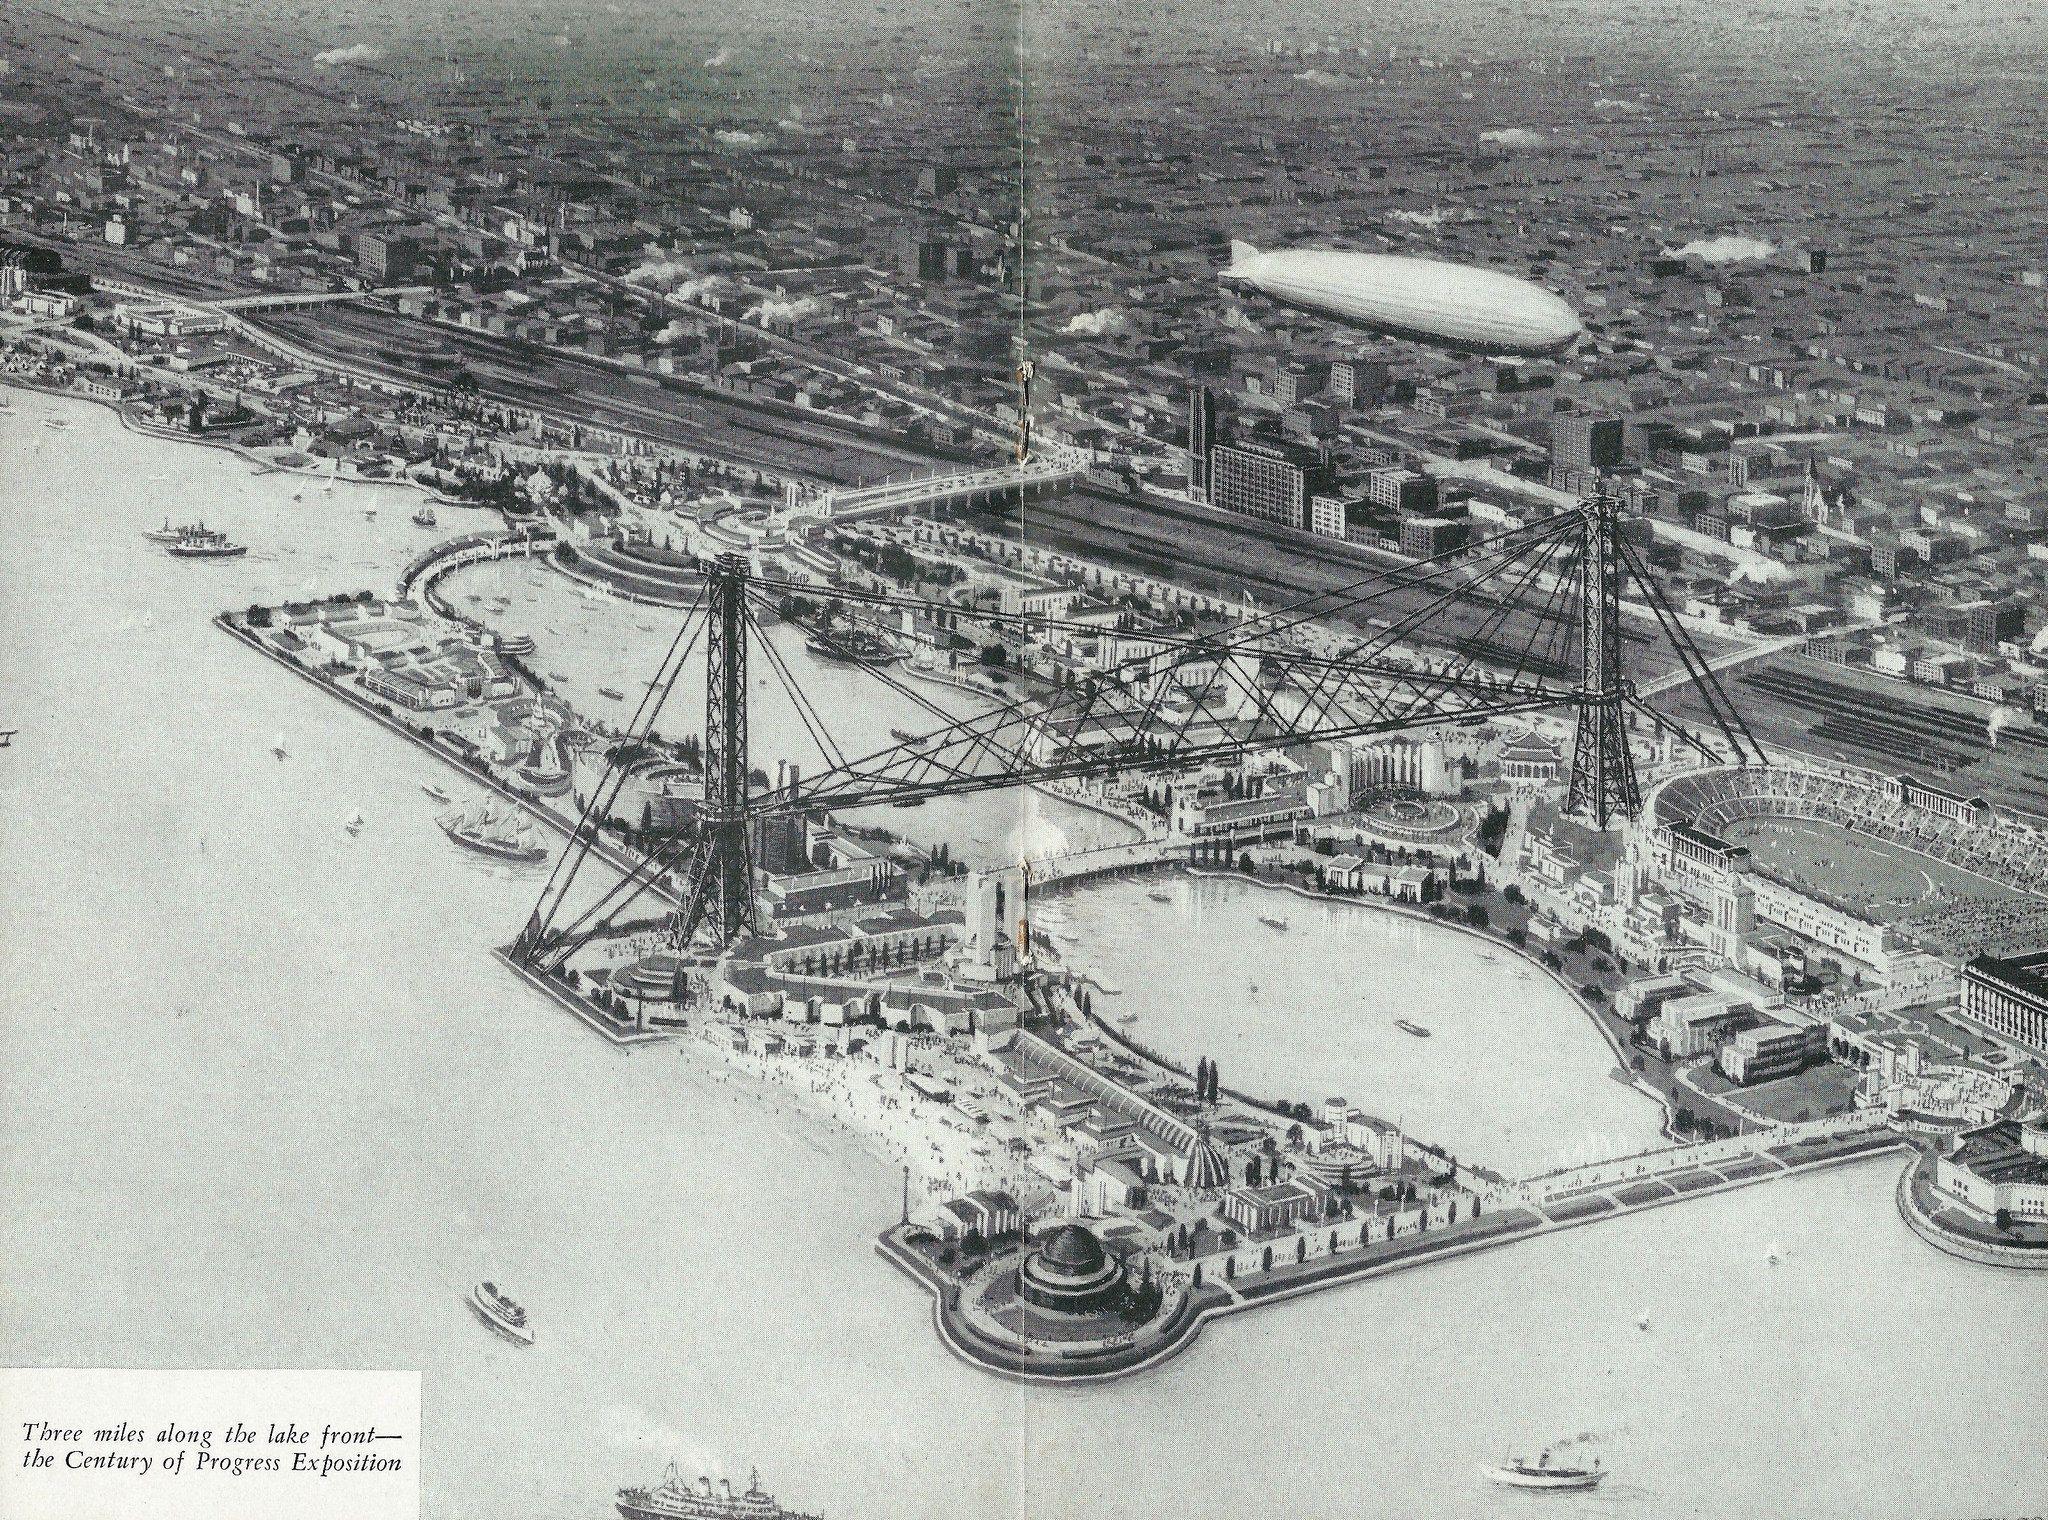 https://flic.kr/p/KmFKTc | The 1933 Century Of Progress Exposition Grounds (Chicago World's Fair) From The Burlington Railroad And A Century Of Progress Brochure